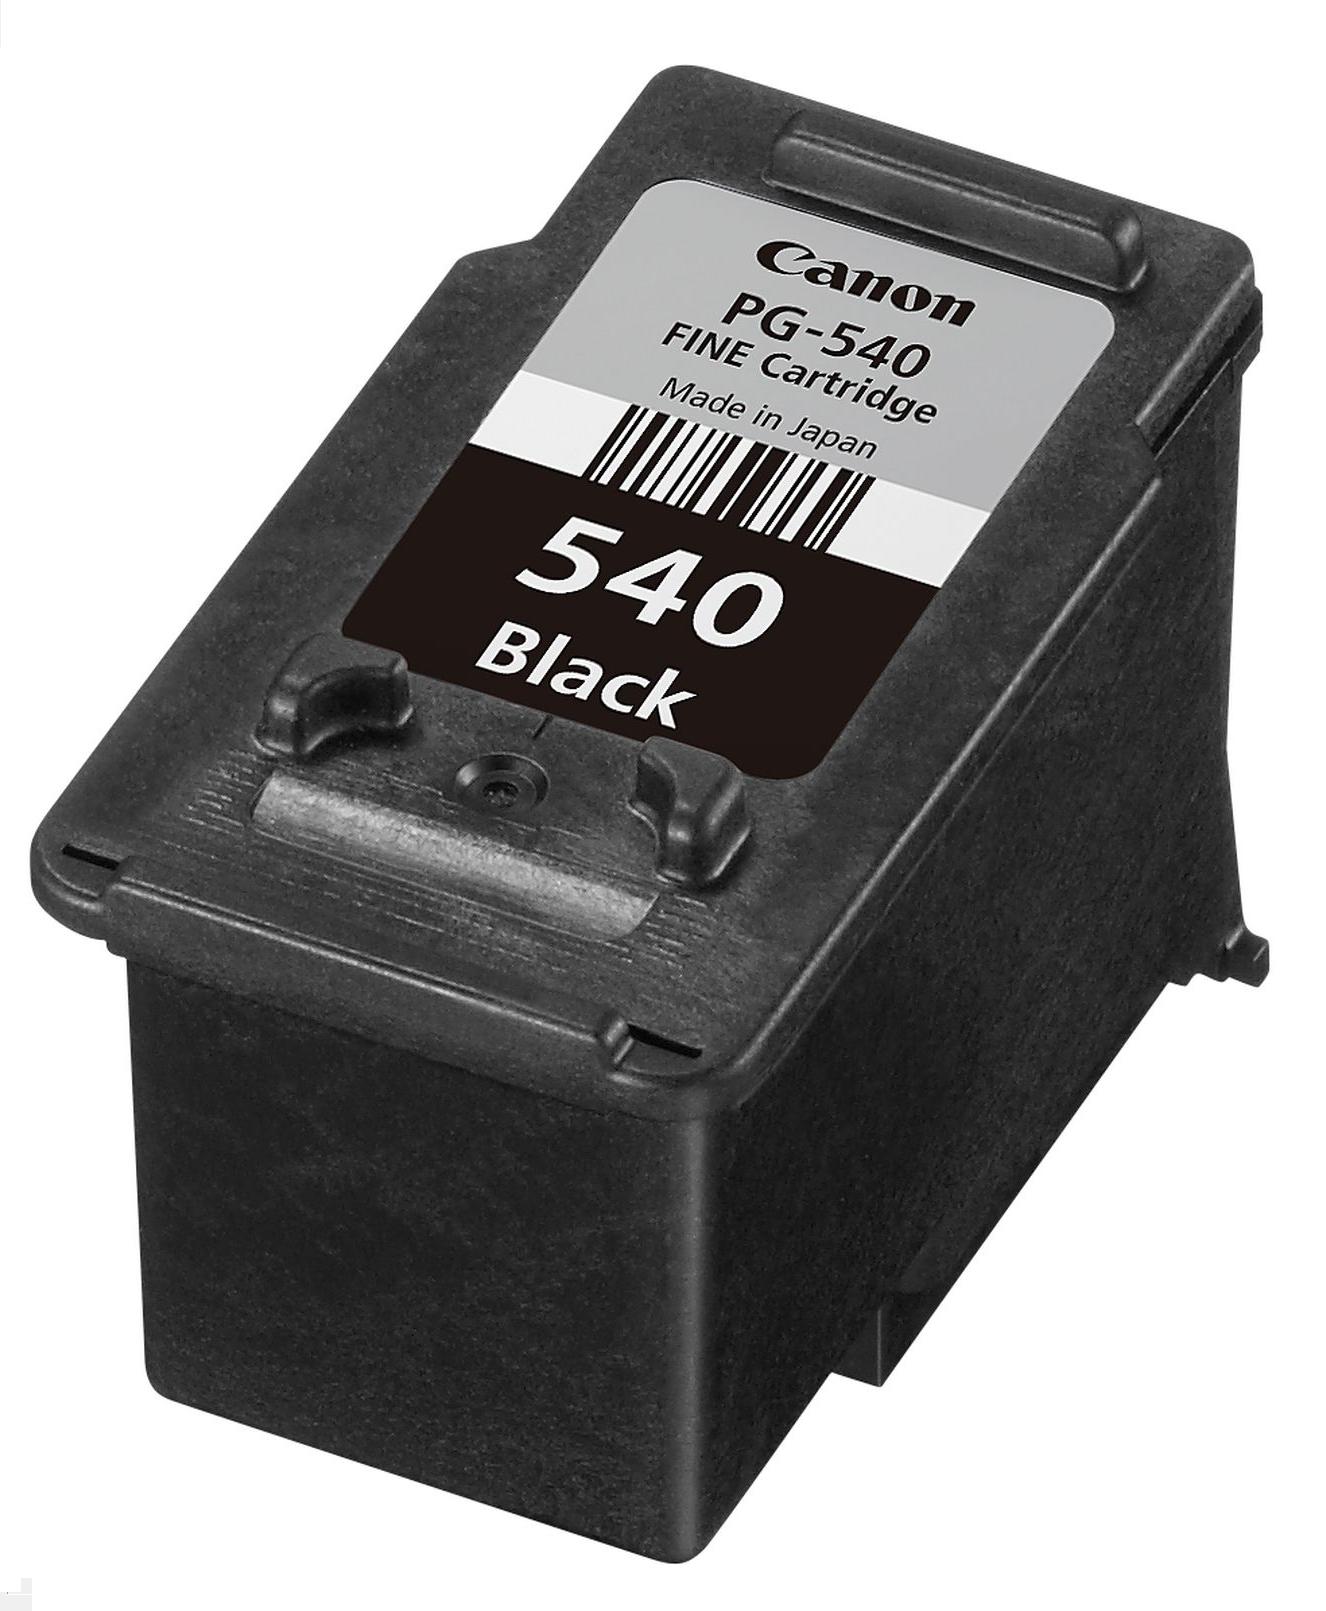 PG-540 inkjetcartridge zwart